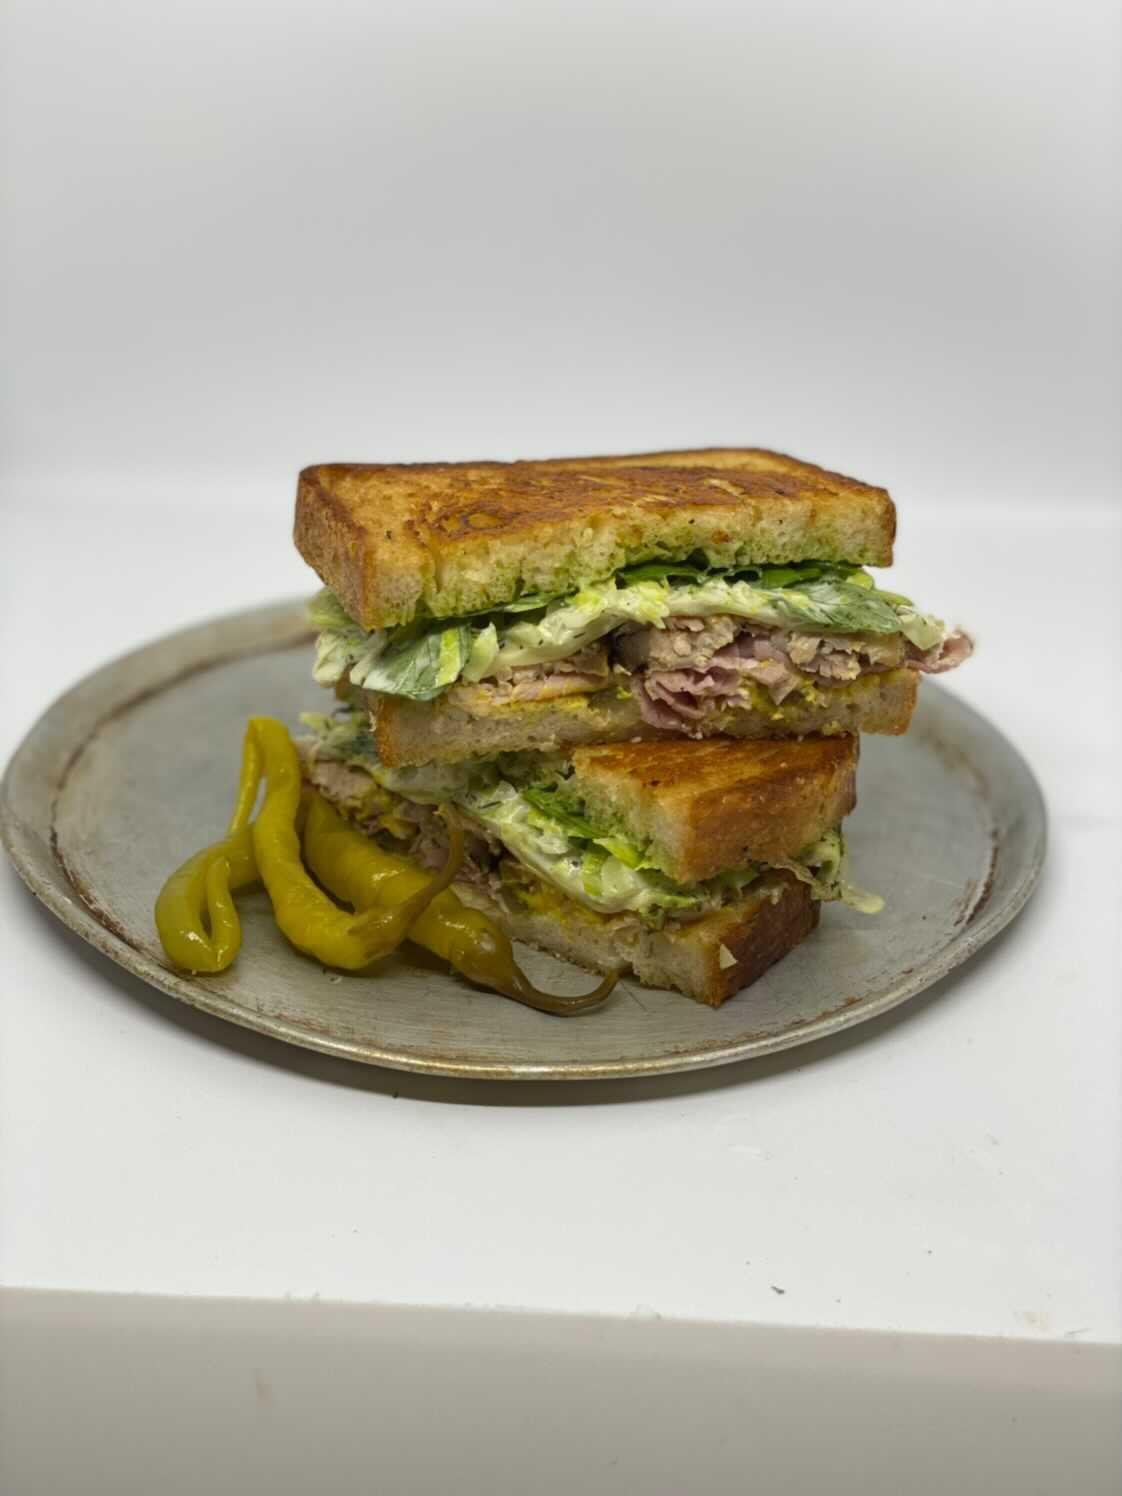 Nico's Cubano sandwich